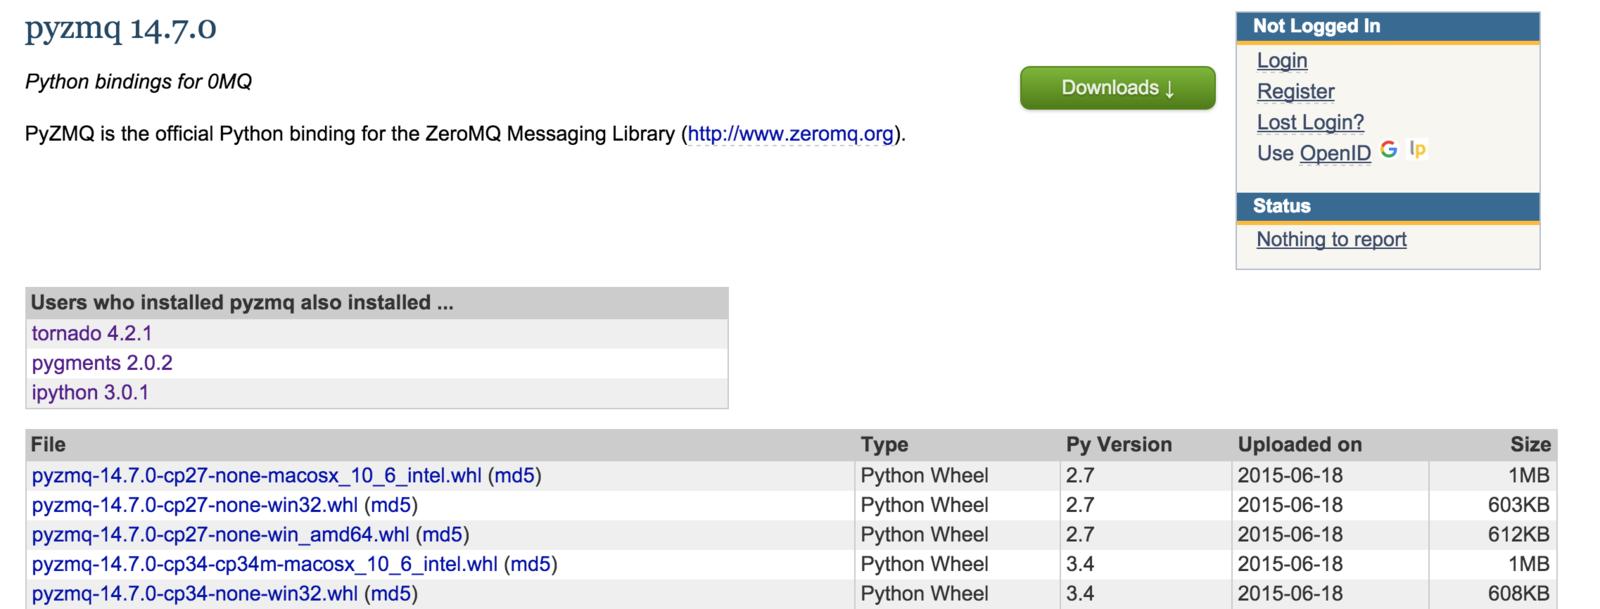 GitHub - CamDavidsonPilon/PyconCanada2015: My scrapers, data